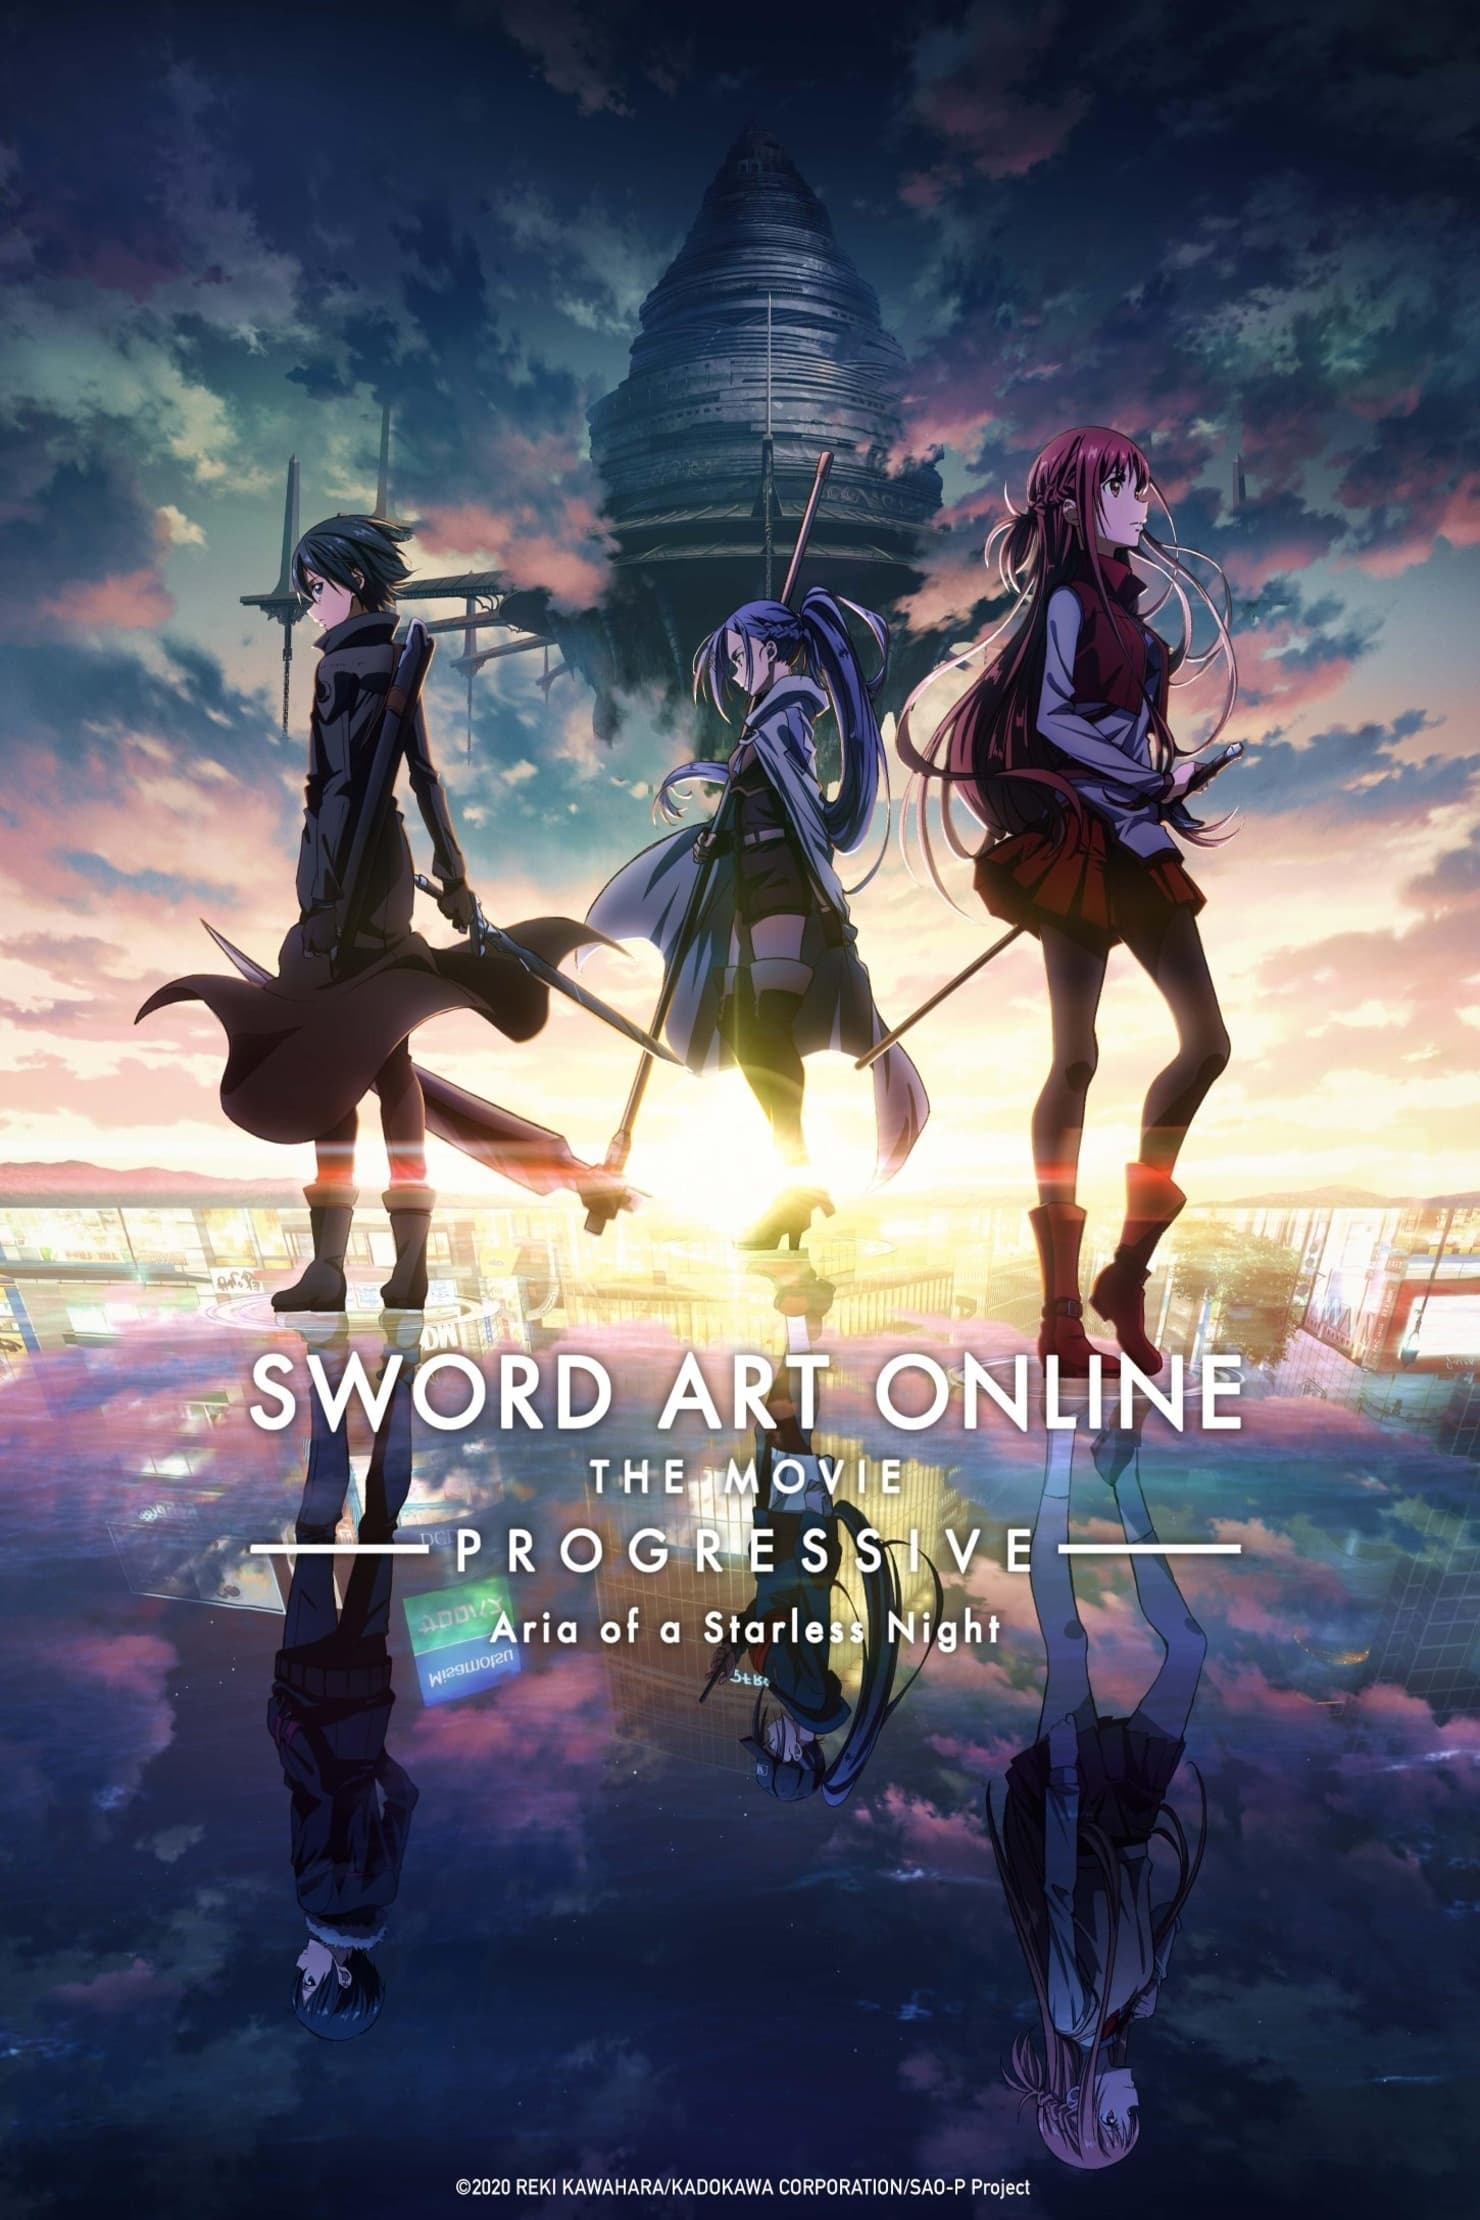 Sword Art Online: Progressive - Aria of a Starless Night (2021)